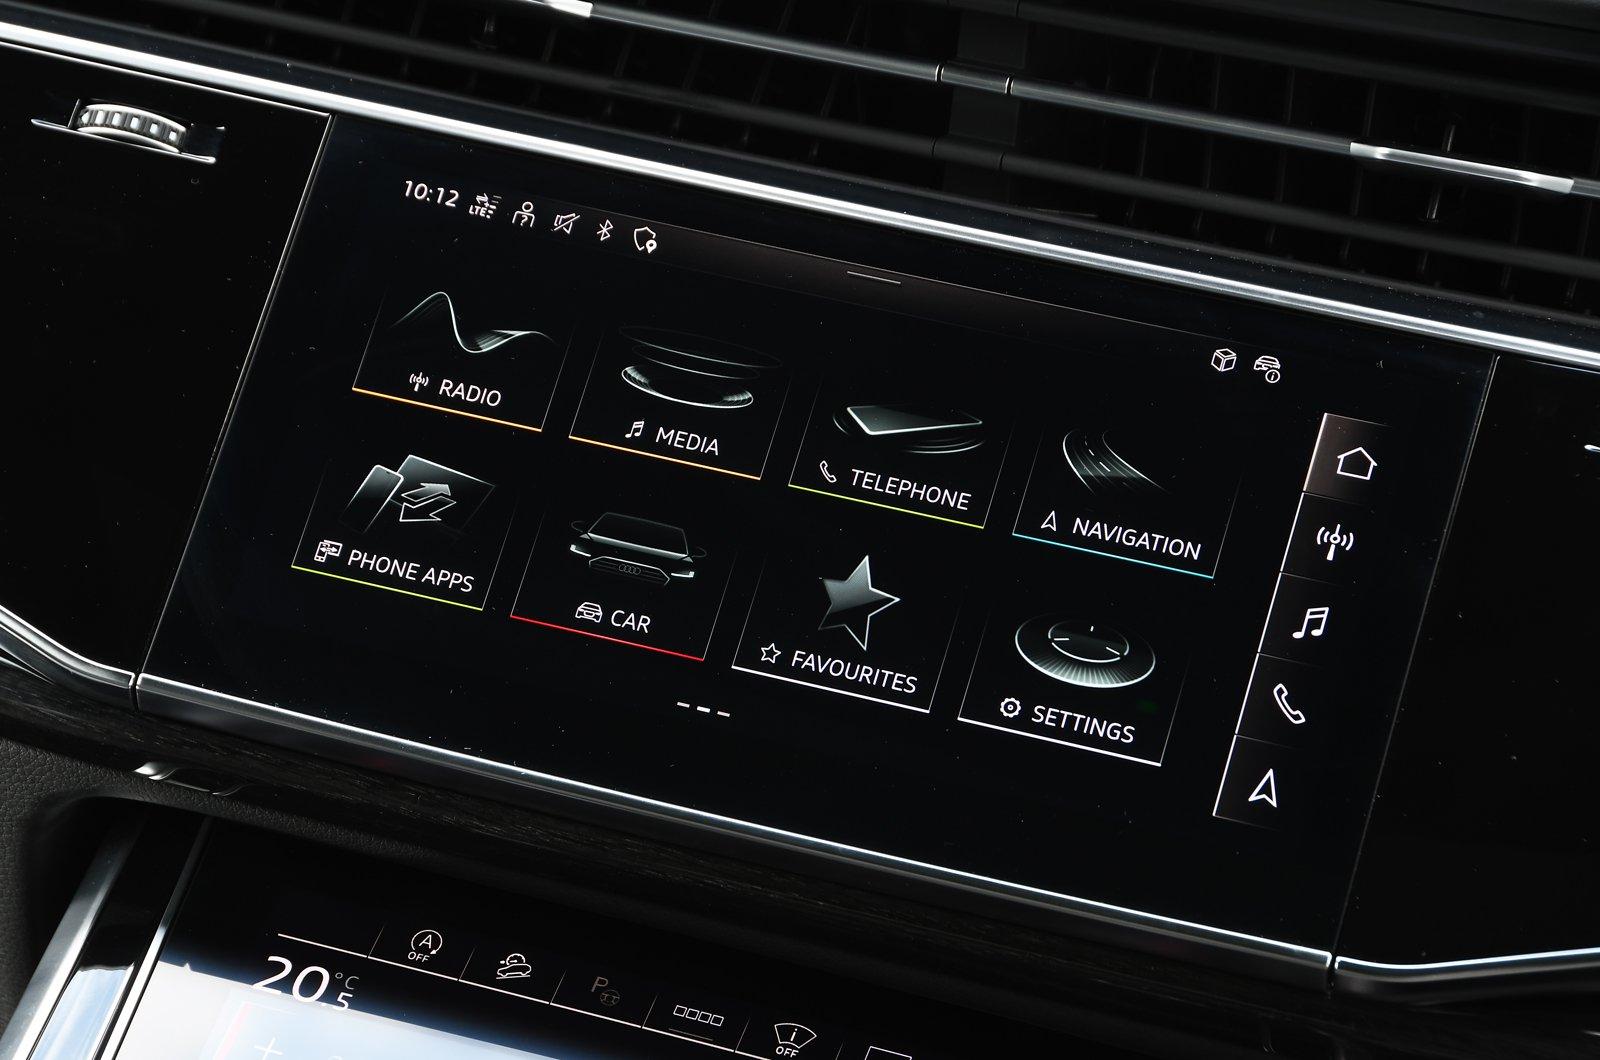 Audi Q7 2021 touchscreen